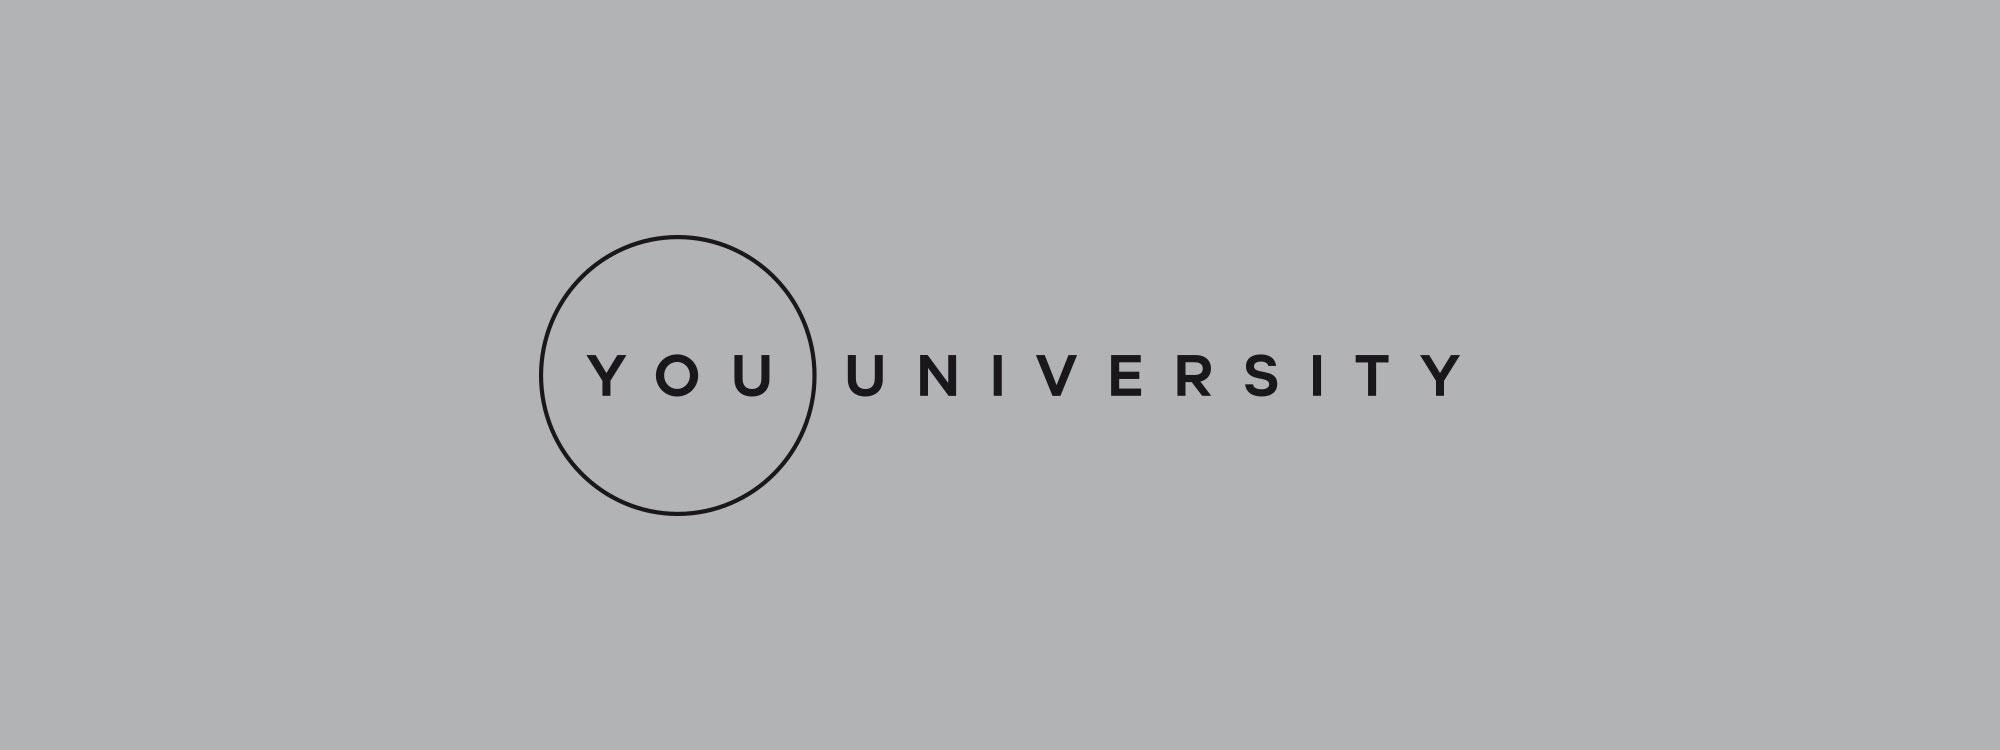 You_university4.jpg